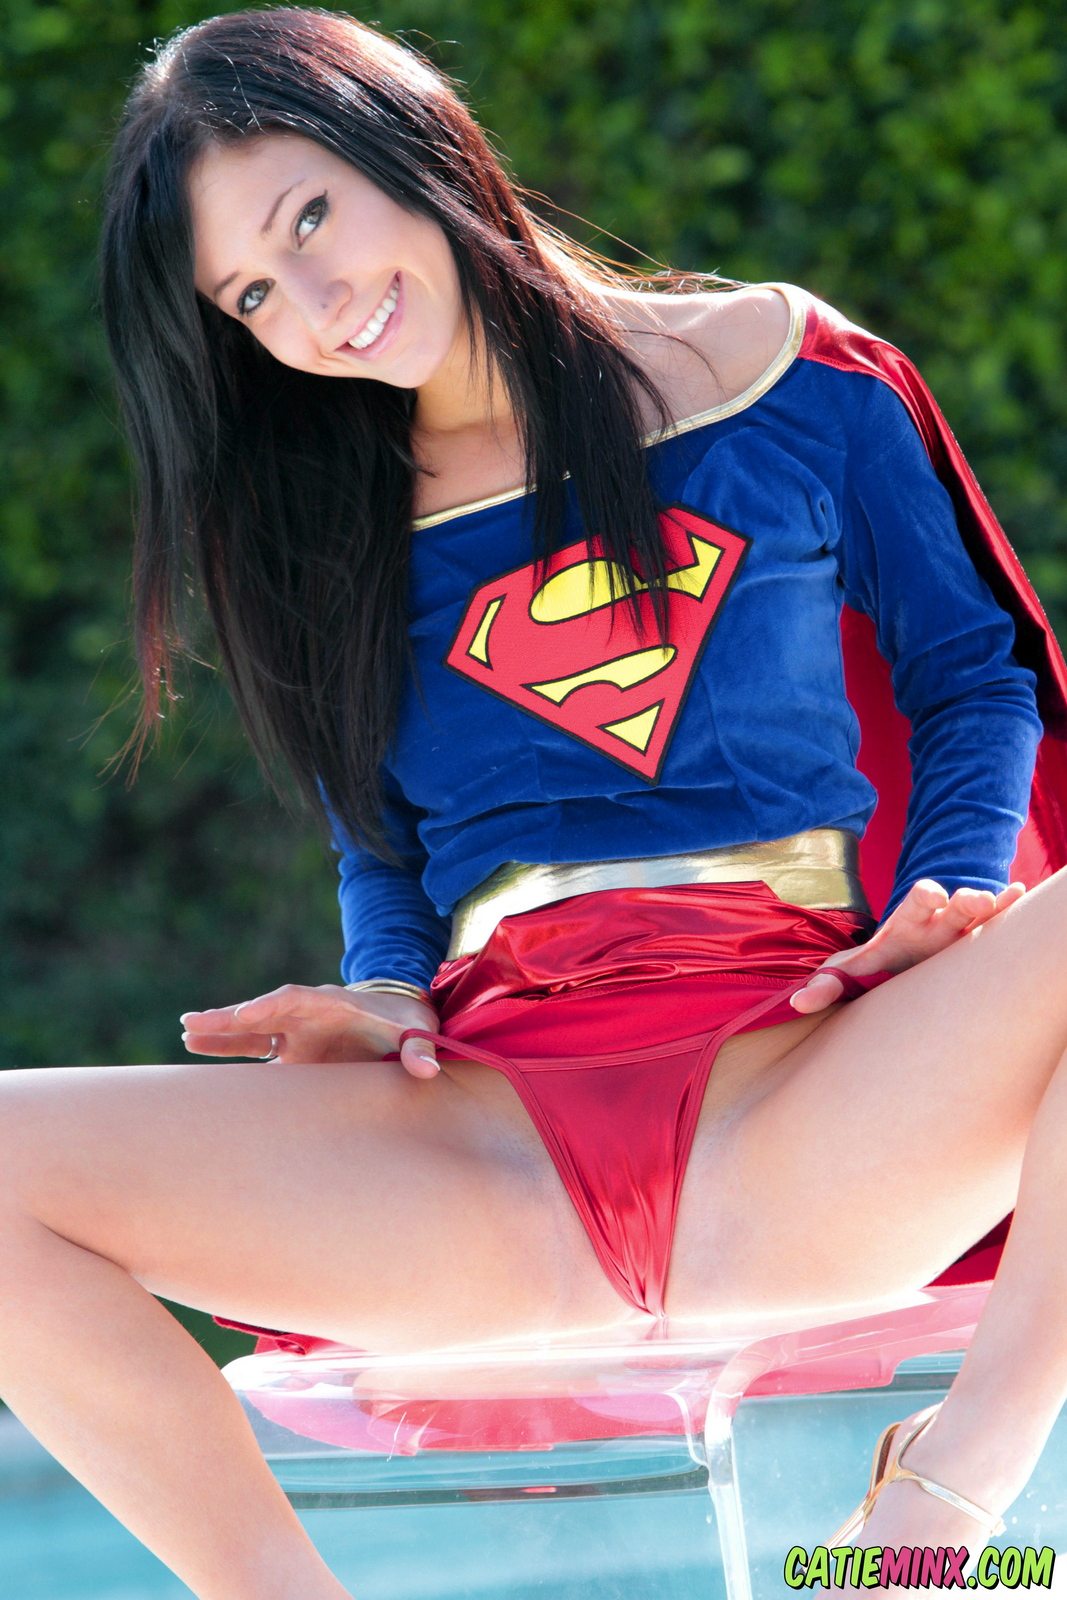 catie-minx-supergirl-costiume-poolside-young-brunette-nude-08